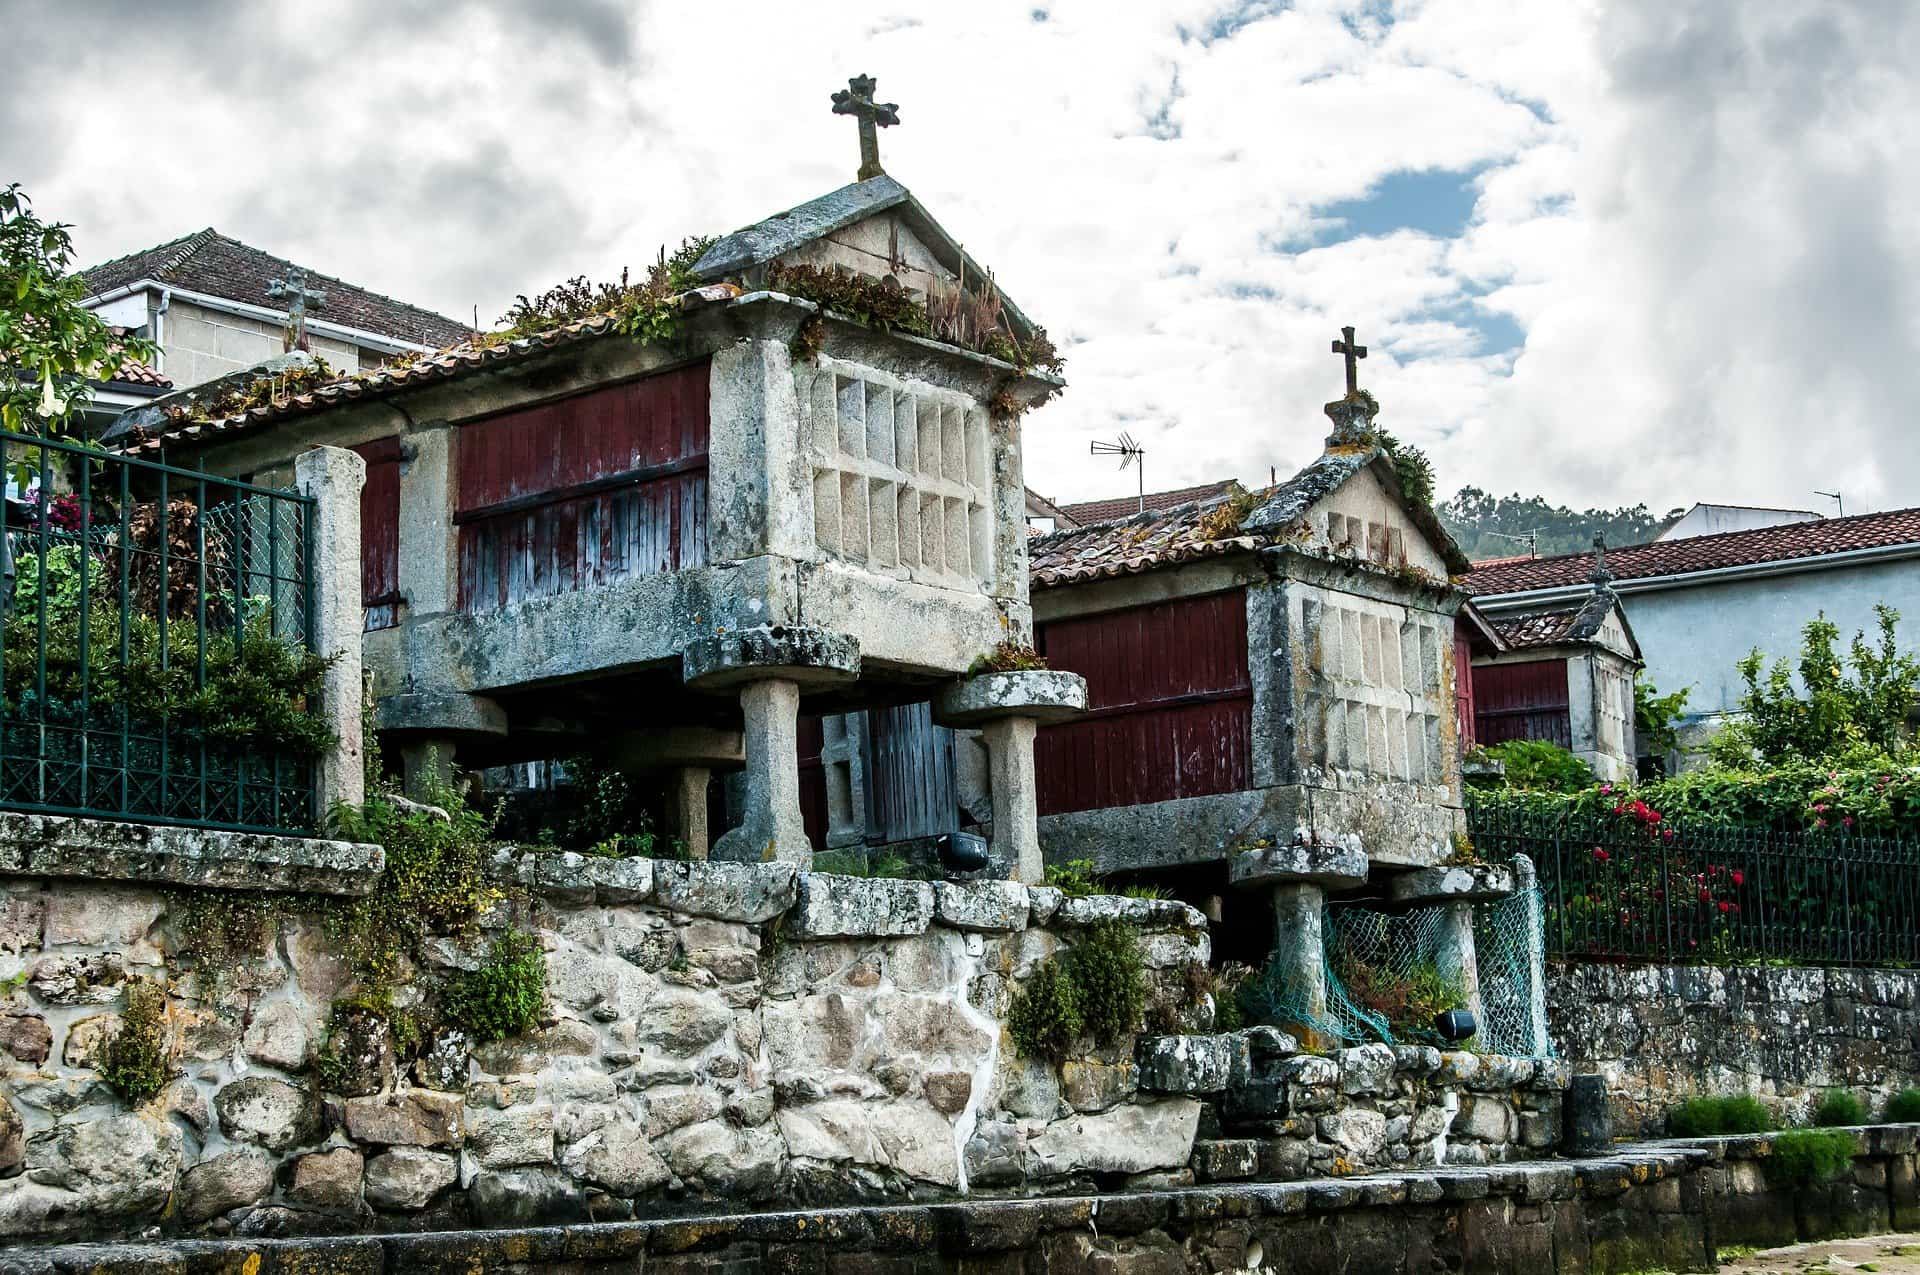 Descubre las mejores ciudades españolas para ir de tapas 10